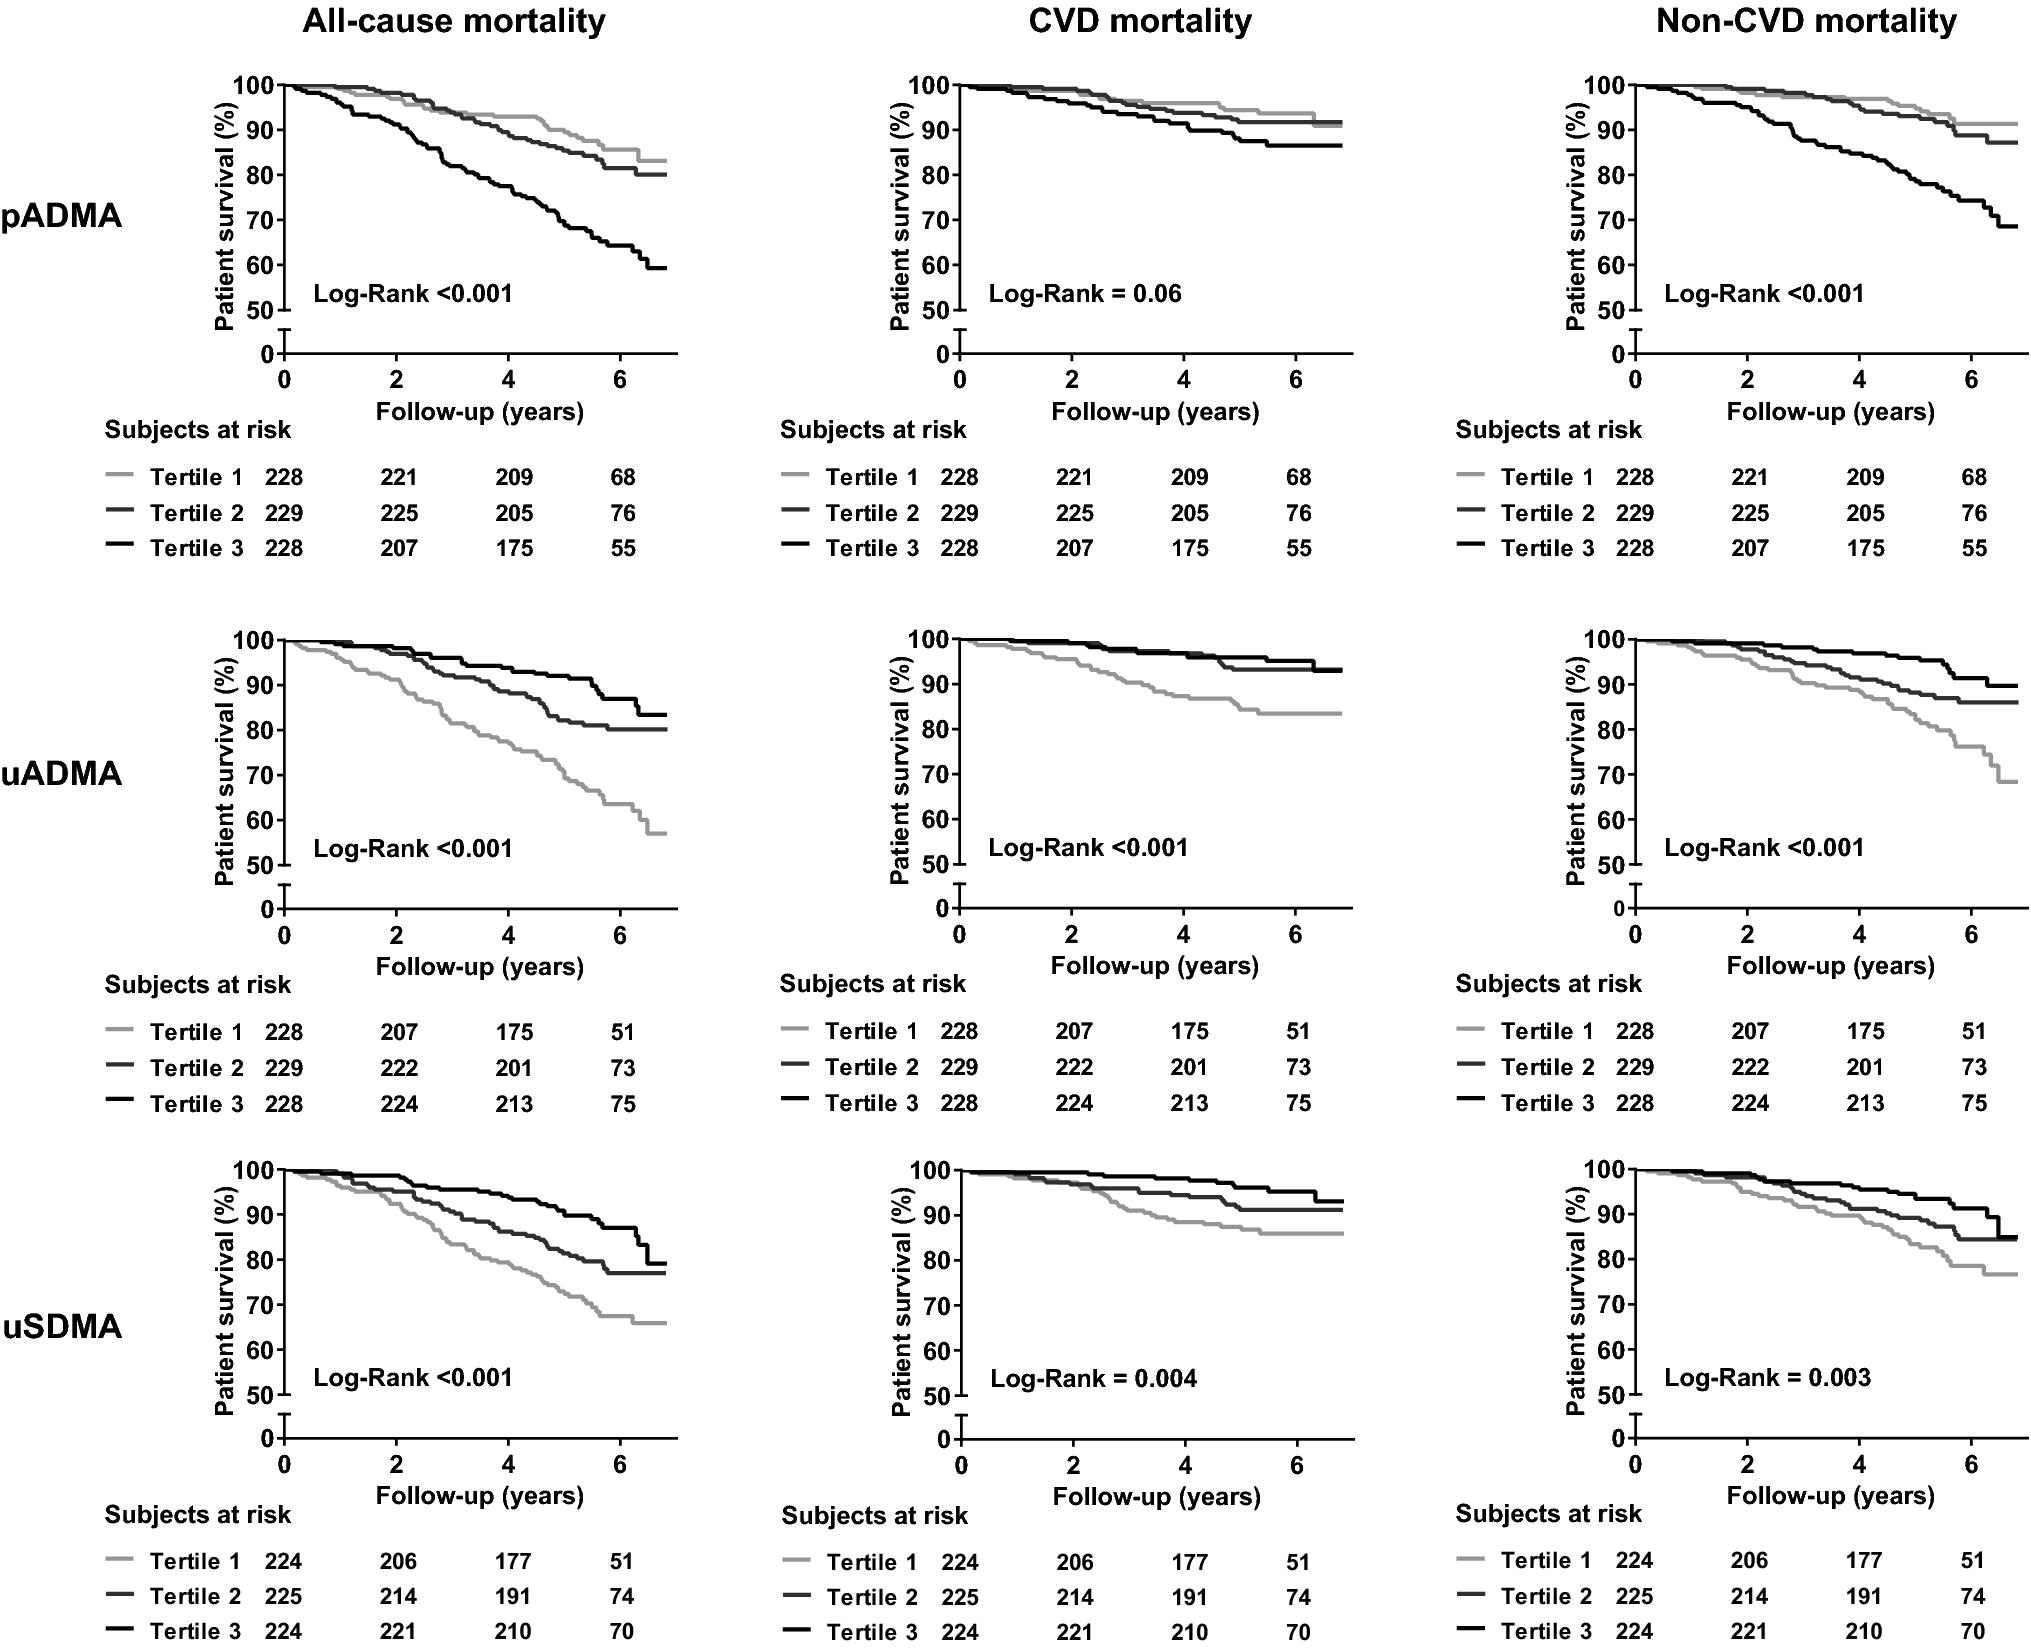 Plasma ADMA, urinary ADMA excretion, and late mortality in